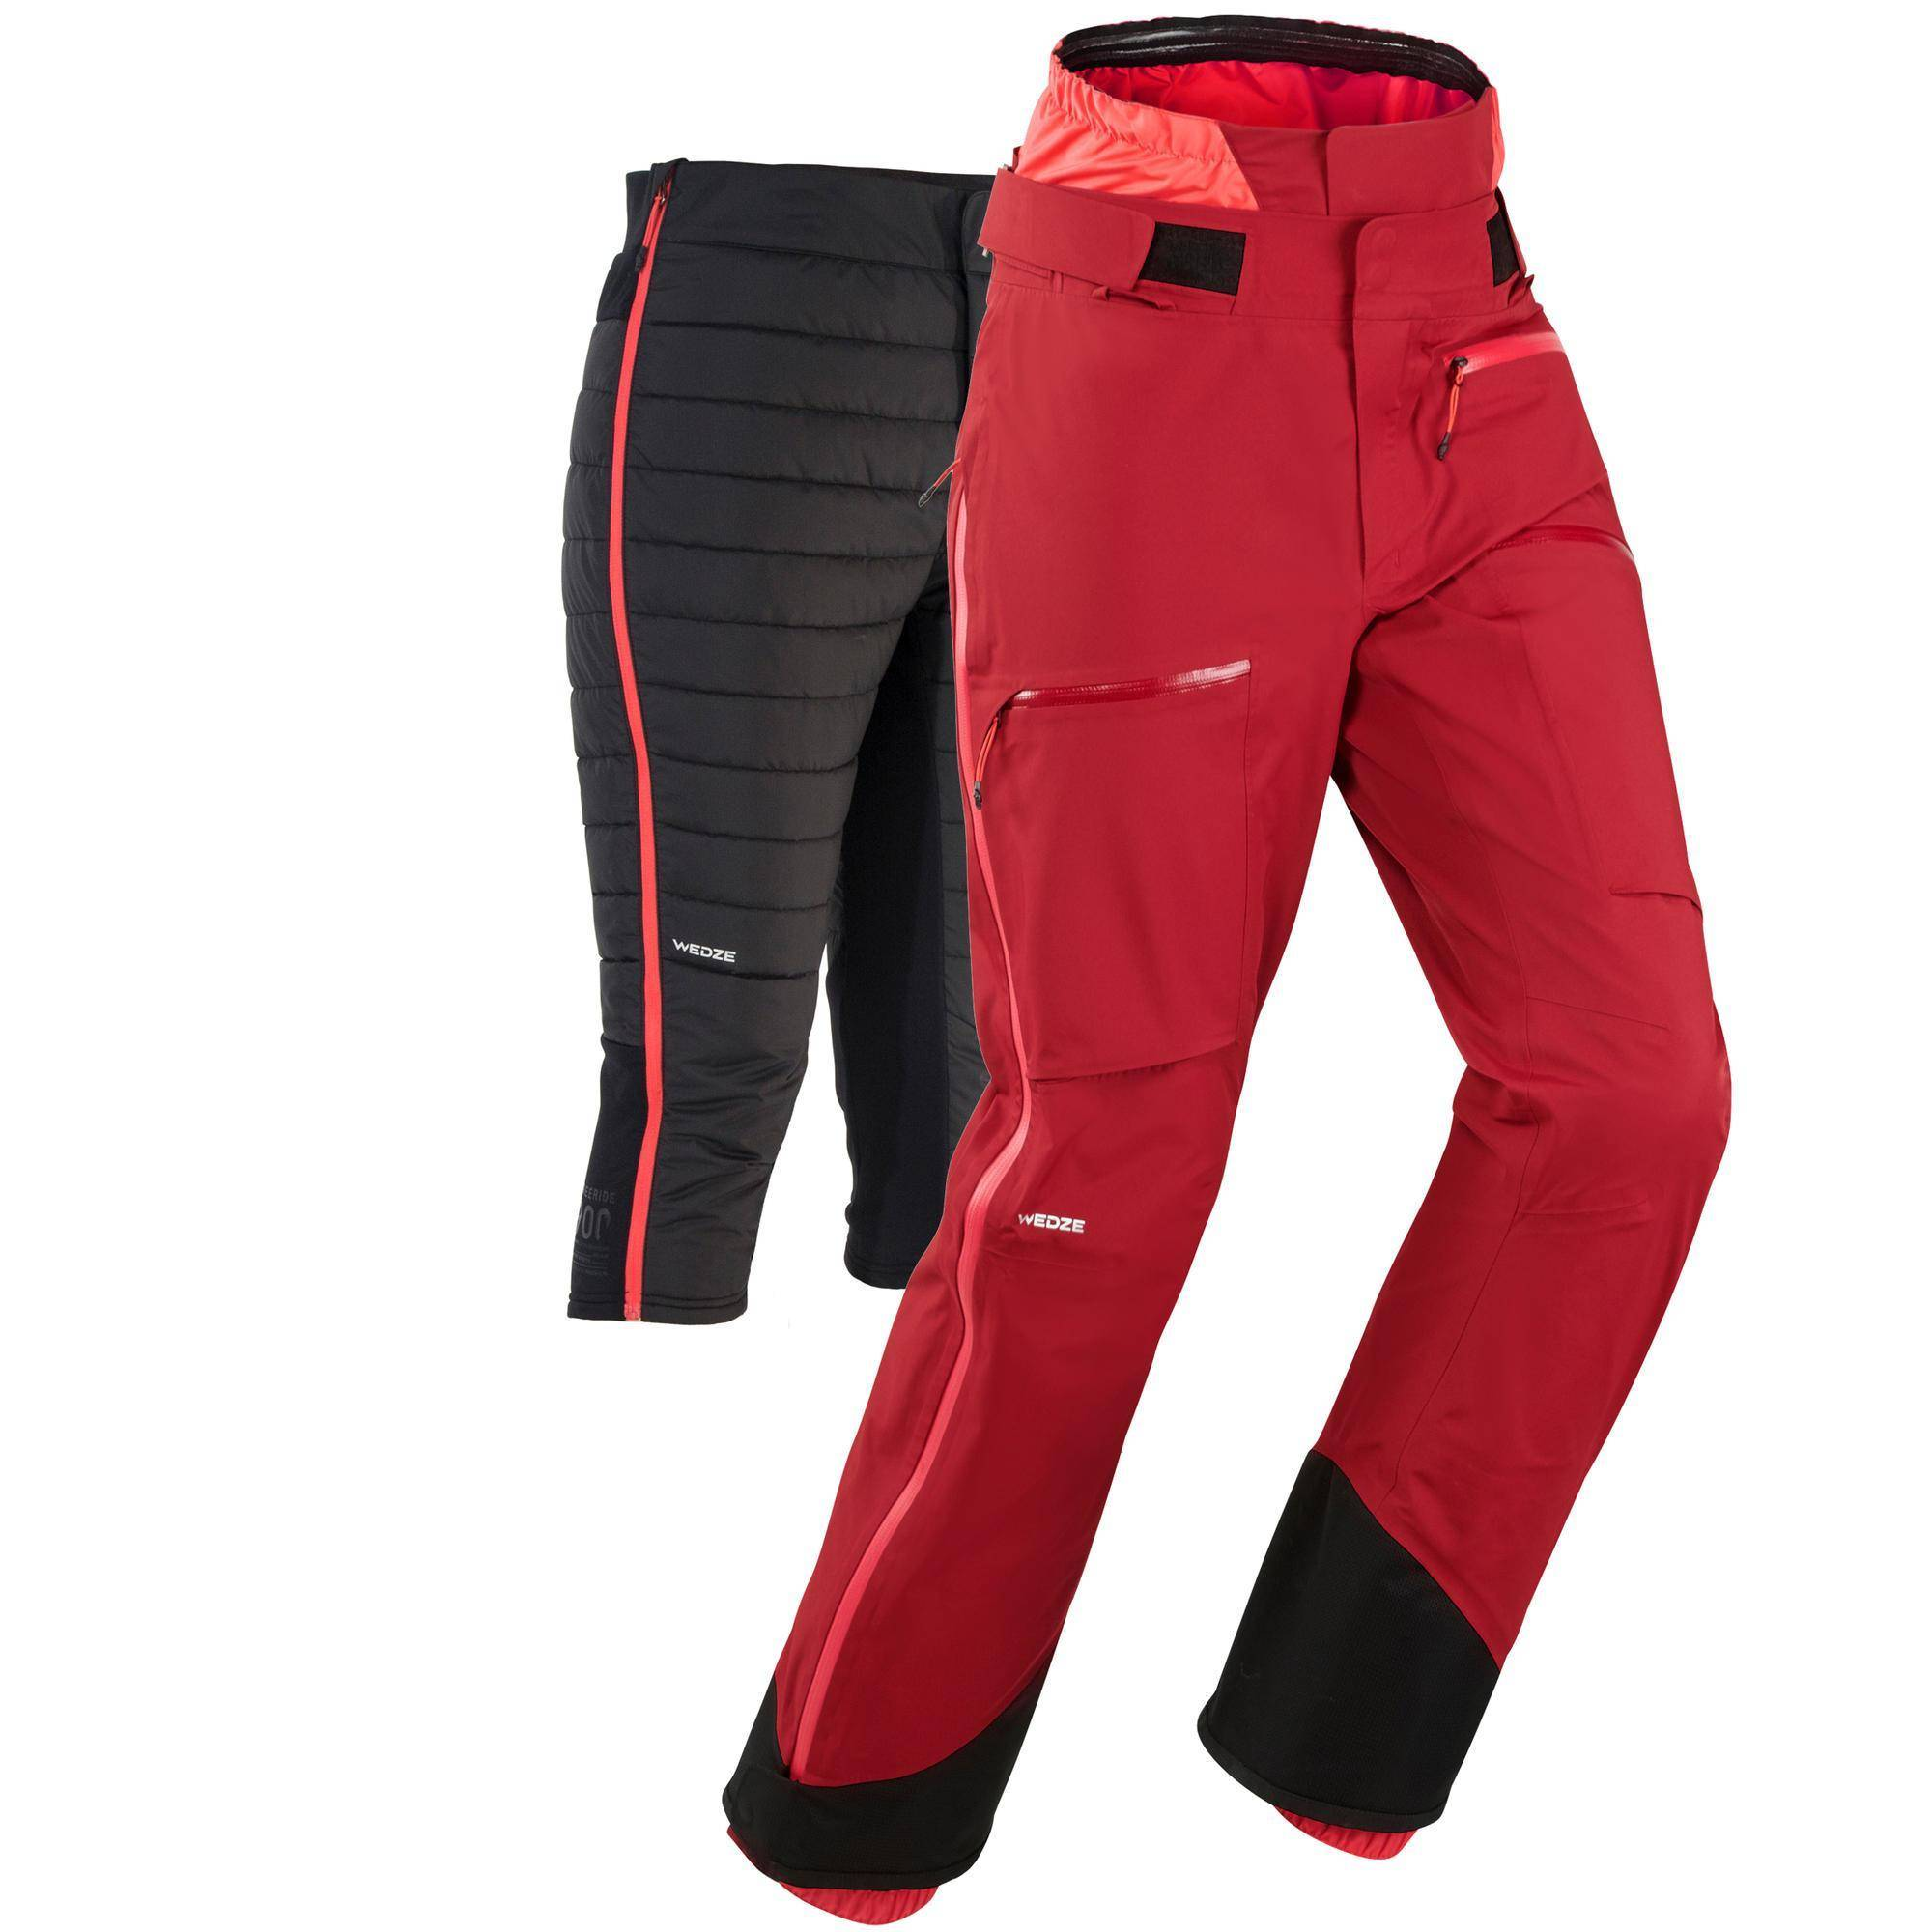 Wedze Pantalon de ski freeride femme FR900 bordeaux - Wedze